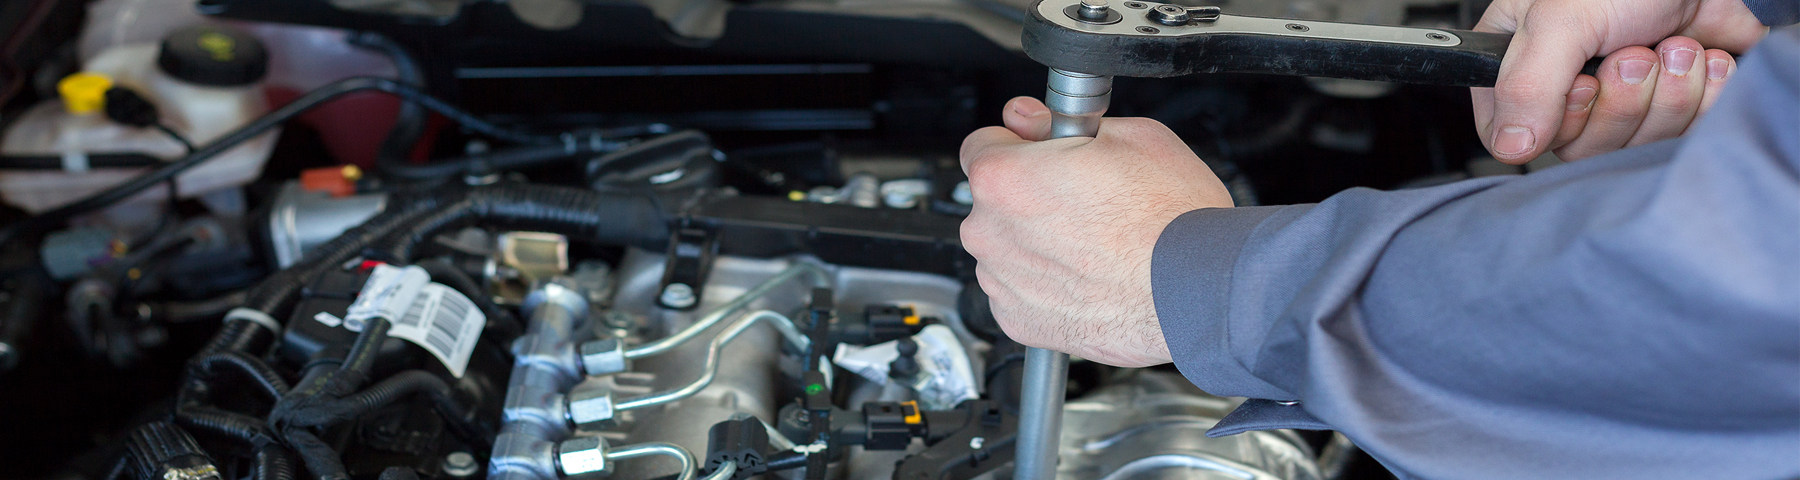 Acheson Auto Works - expert auto repair - Clive, IA 50325